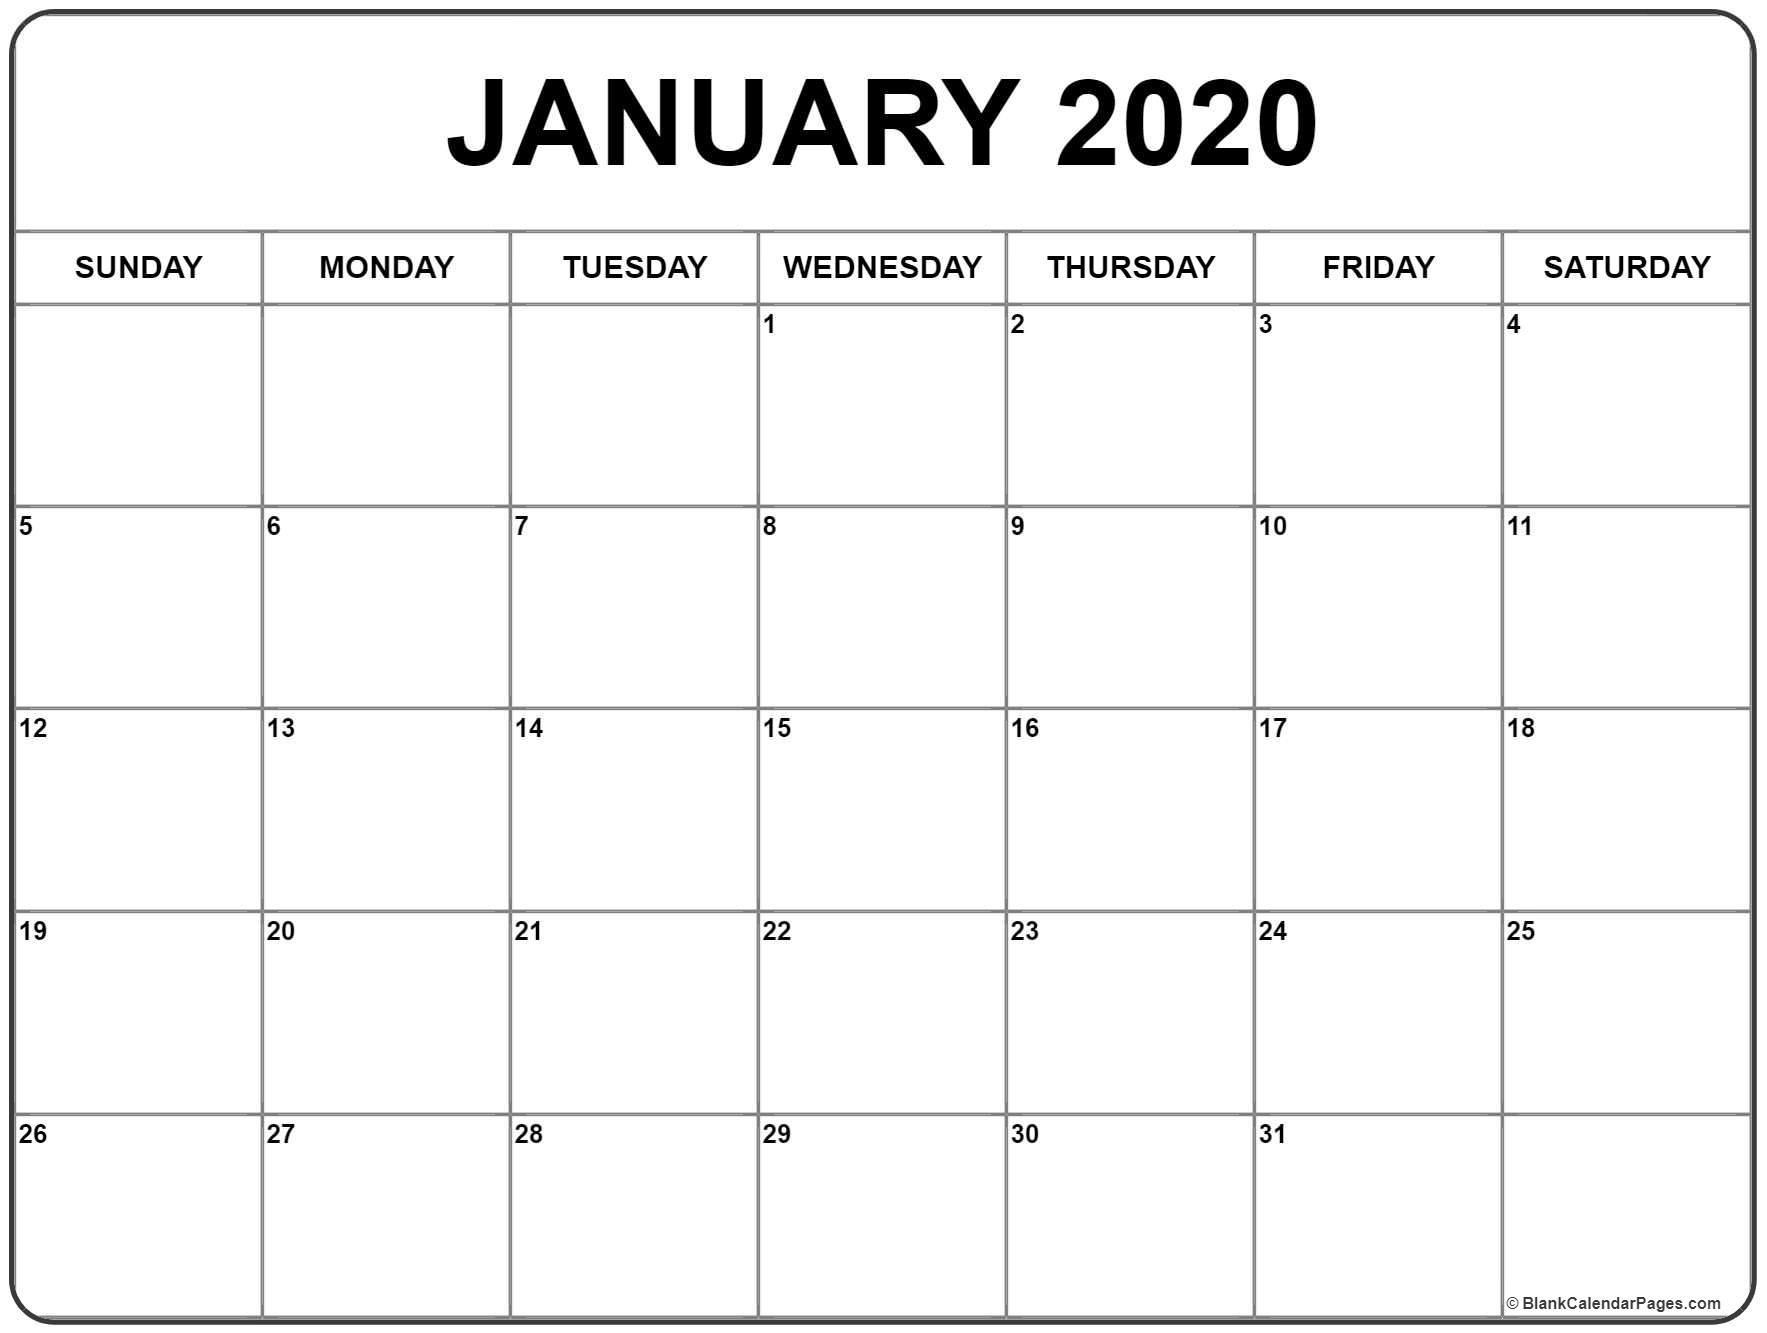 January Calendar 2020 Printable January 2020 Calendar Monthly